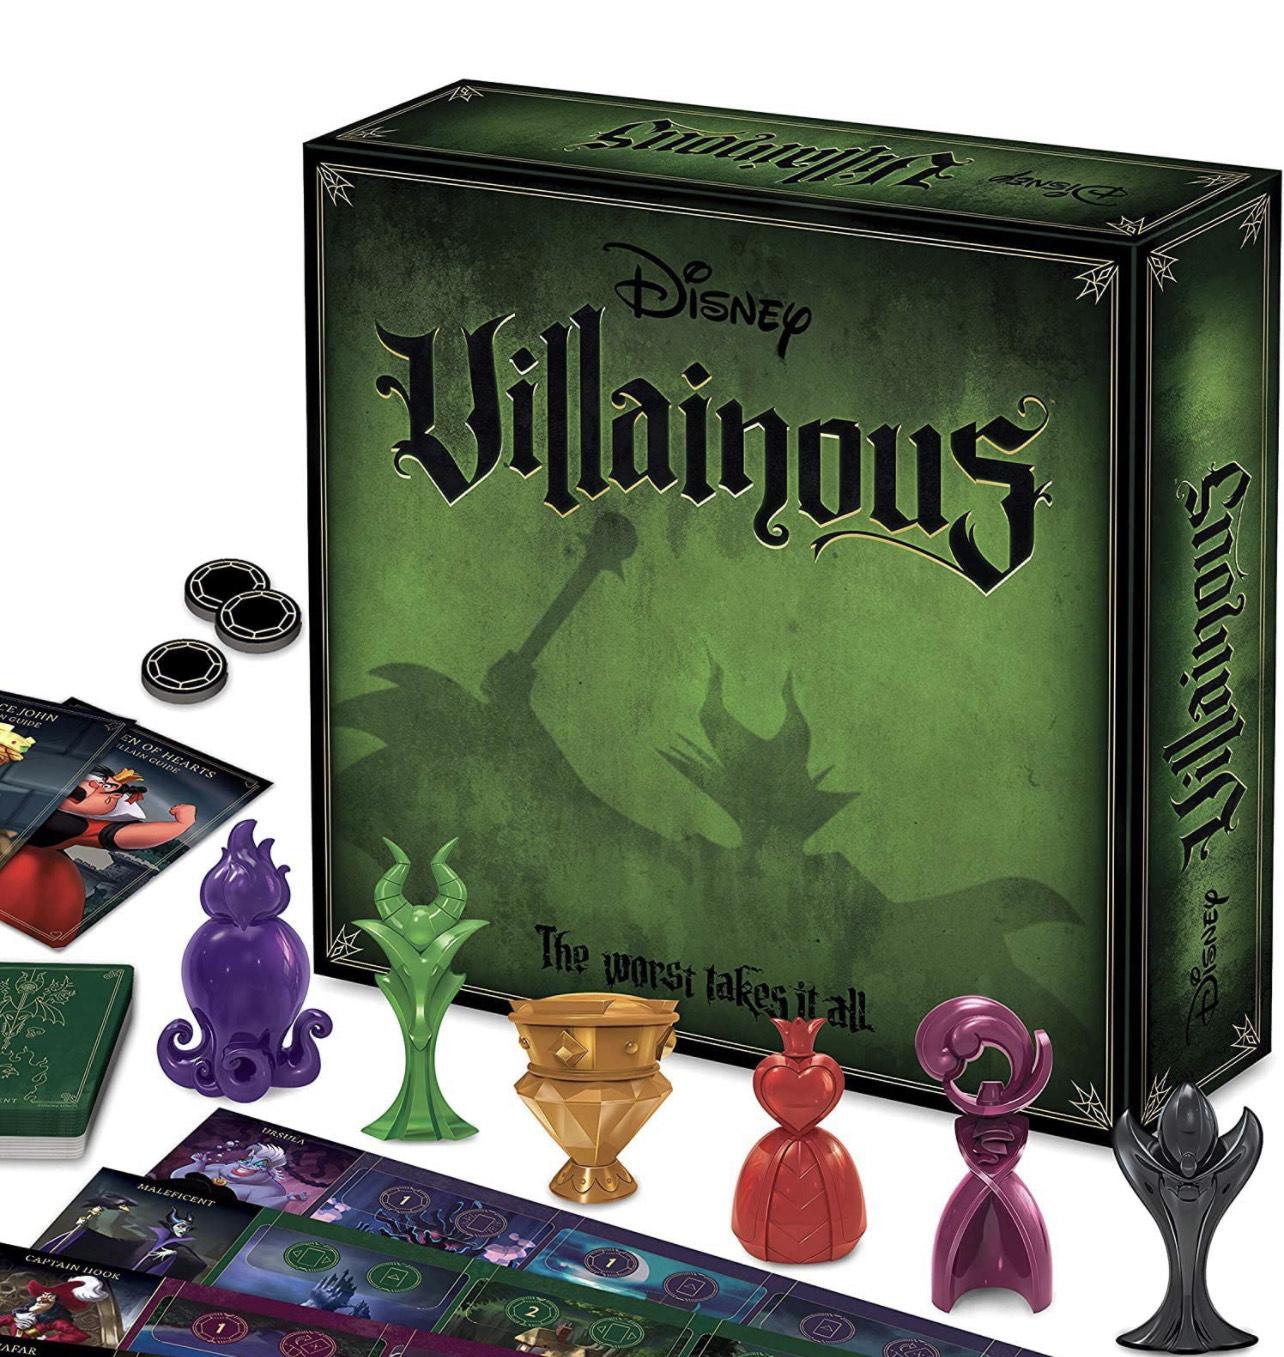 Ravensburger Disney Villainous - Expandable Strategy Game For Kids & Adults - £20.99 @ Amazon